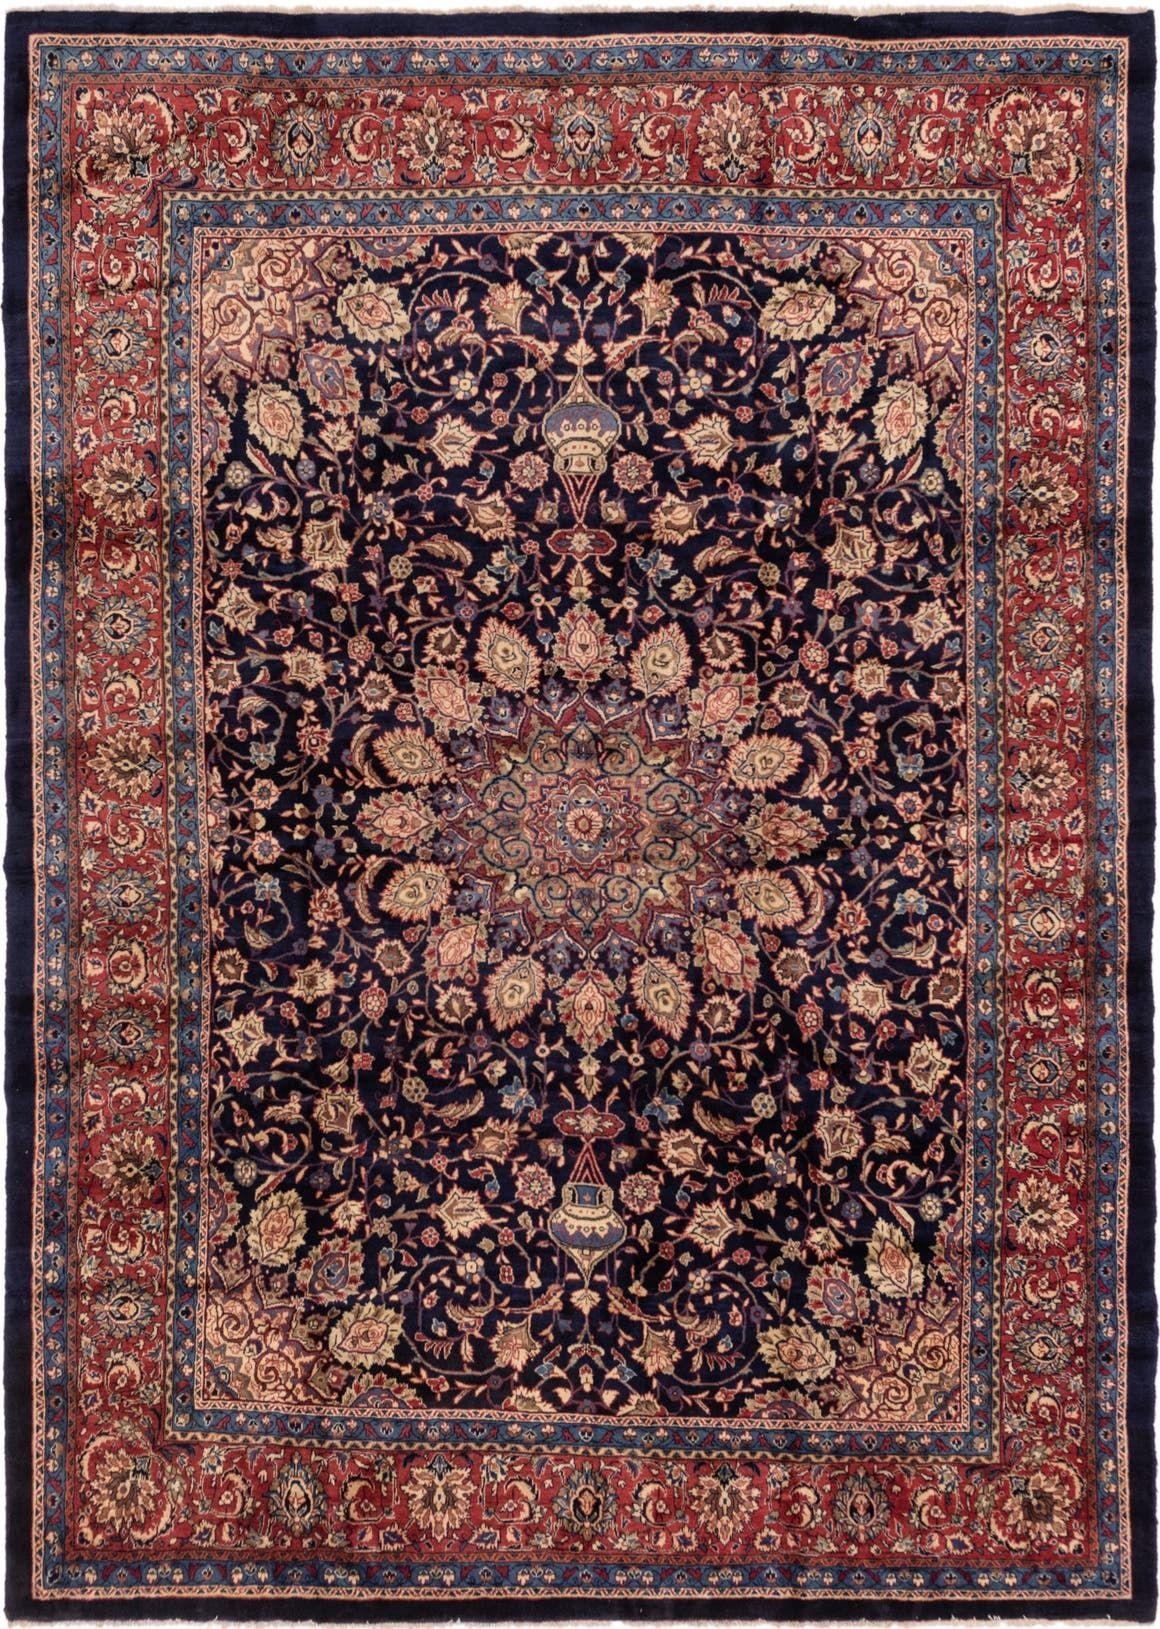 Pin By Nazli Rahimzadeh On Persain Rugs In 2020 Persian Rug Rugs Persian Rug Living Room